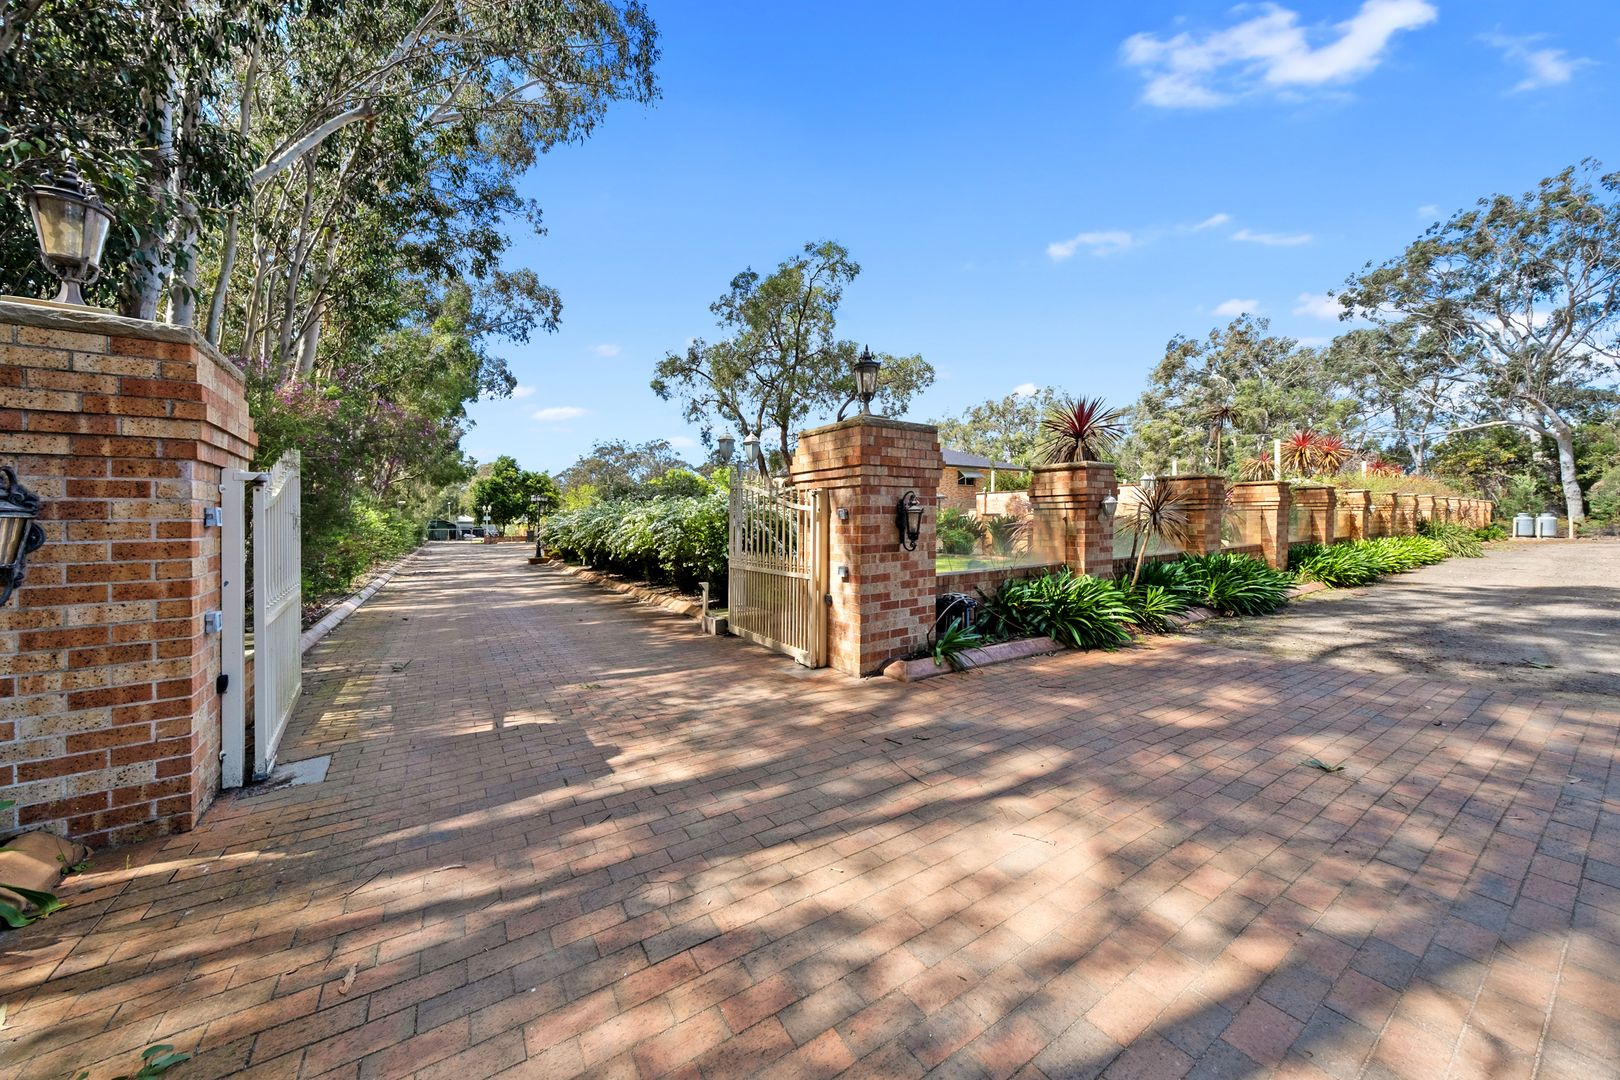 817-821 Castlereagh Road, Castlereagh NSW 2749, Image 1